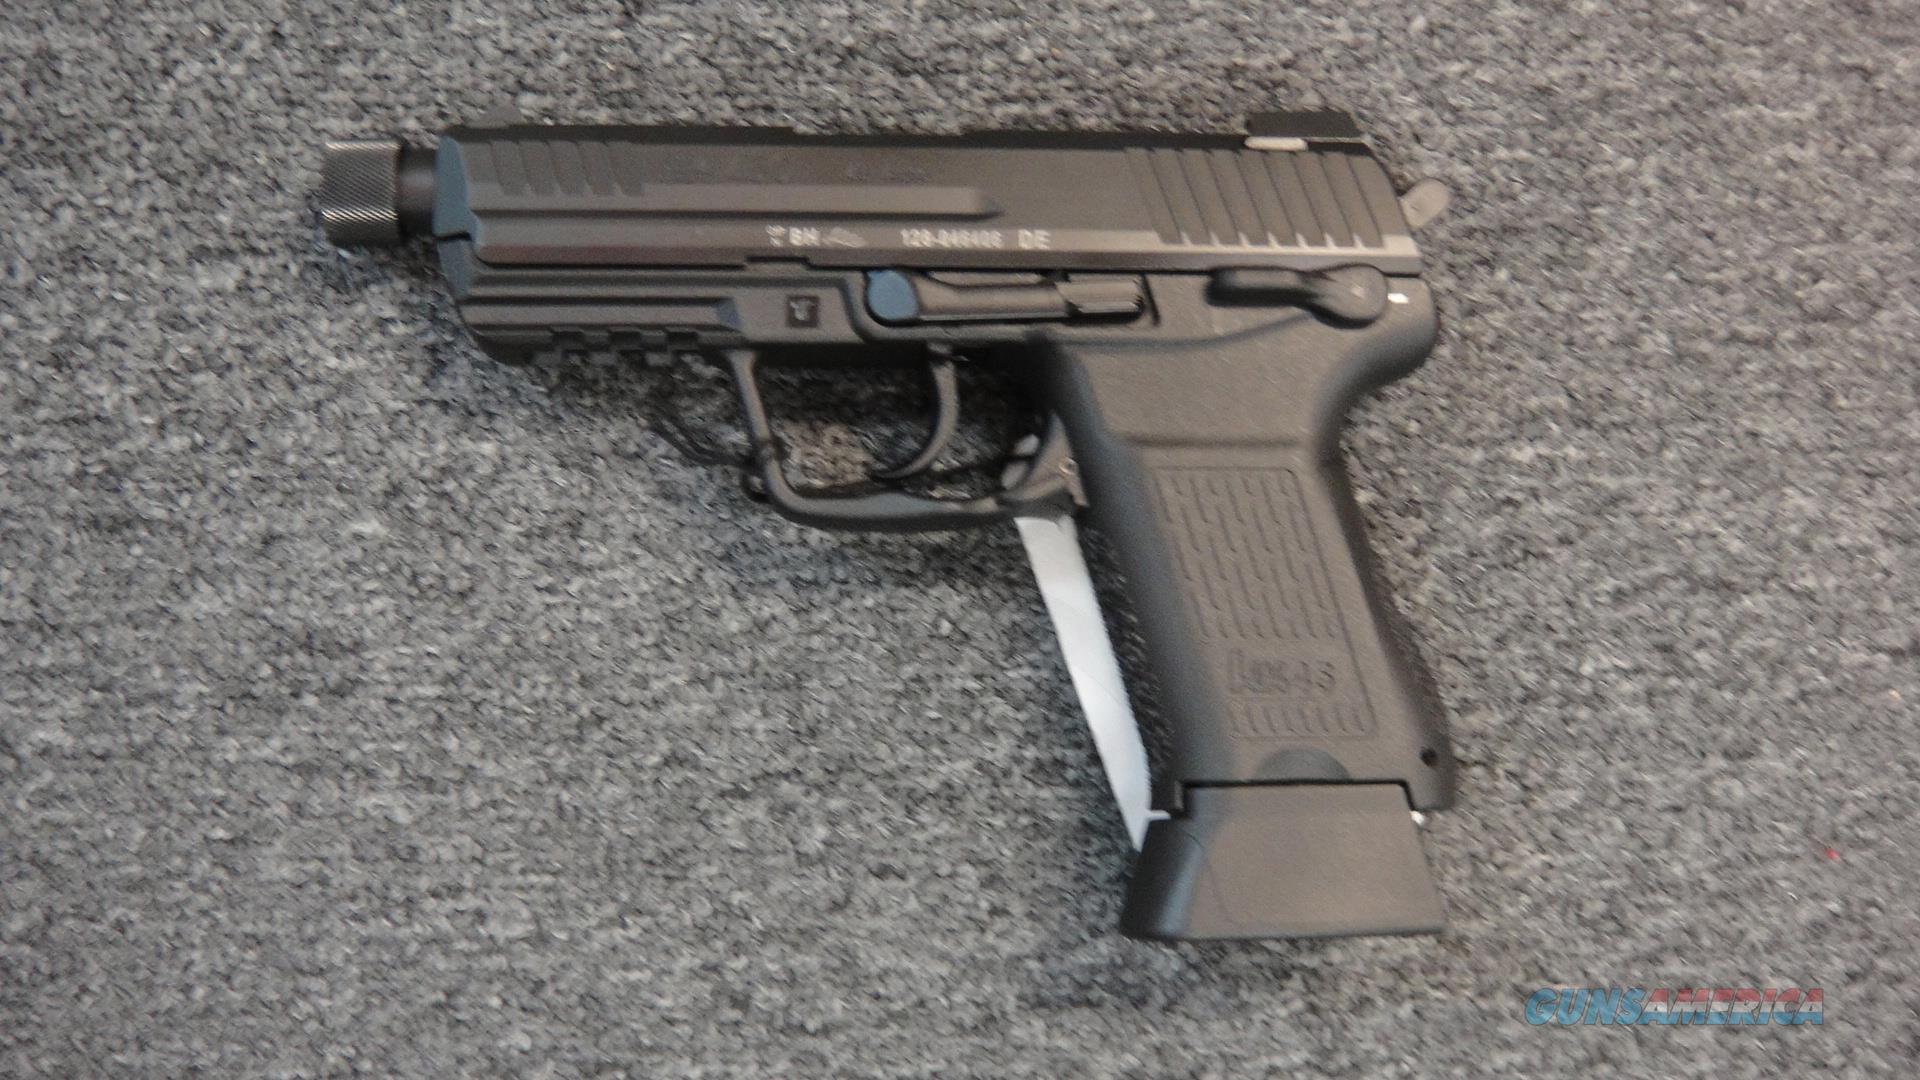 Heckler & Koch HK 45C Tactical V3  Guns > Pistols > Heckler & Koch Pistols > Polymer Frame